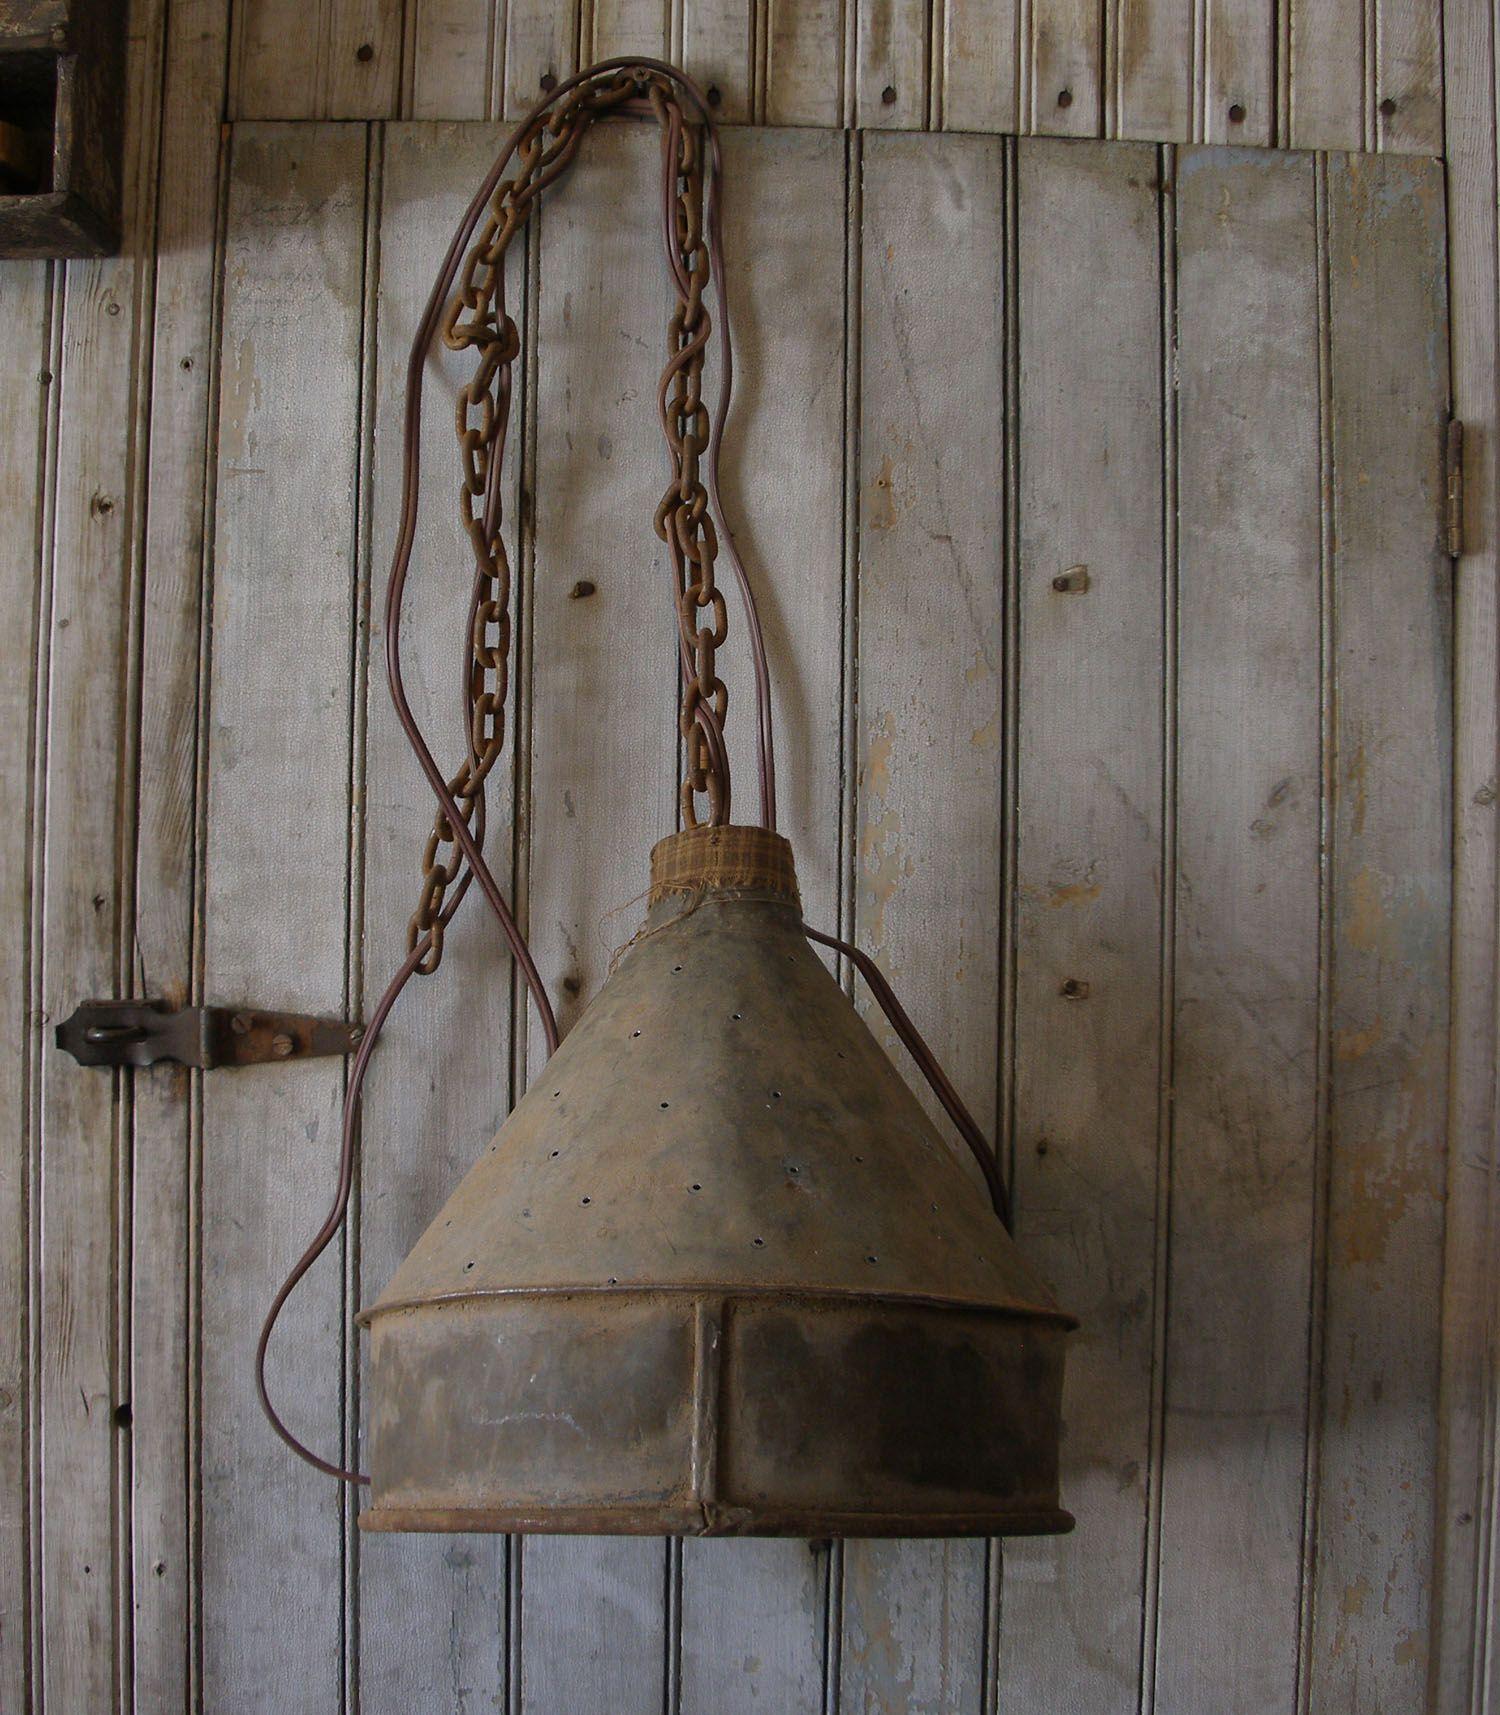 primitive lighting ideas. Primitive Lighting At Sweet Liberty Homestead Ideas A